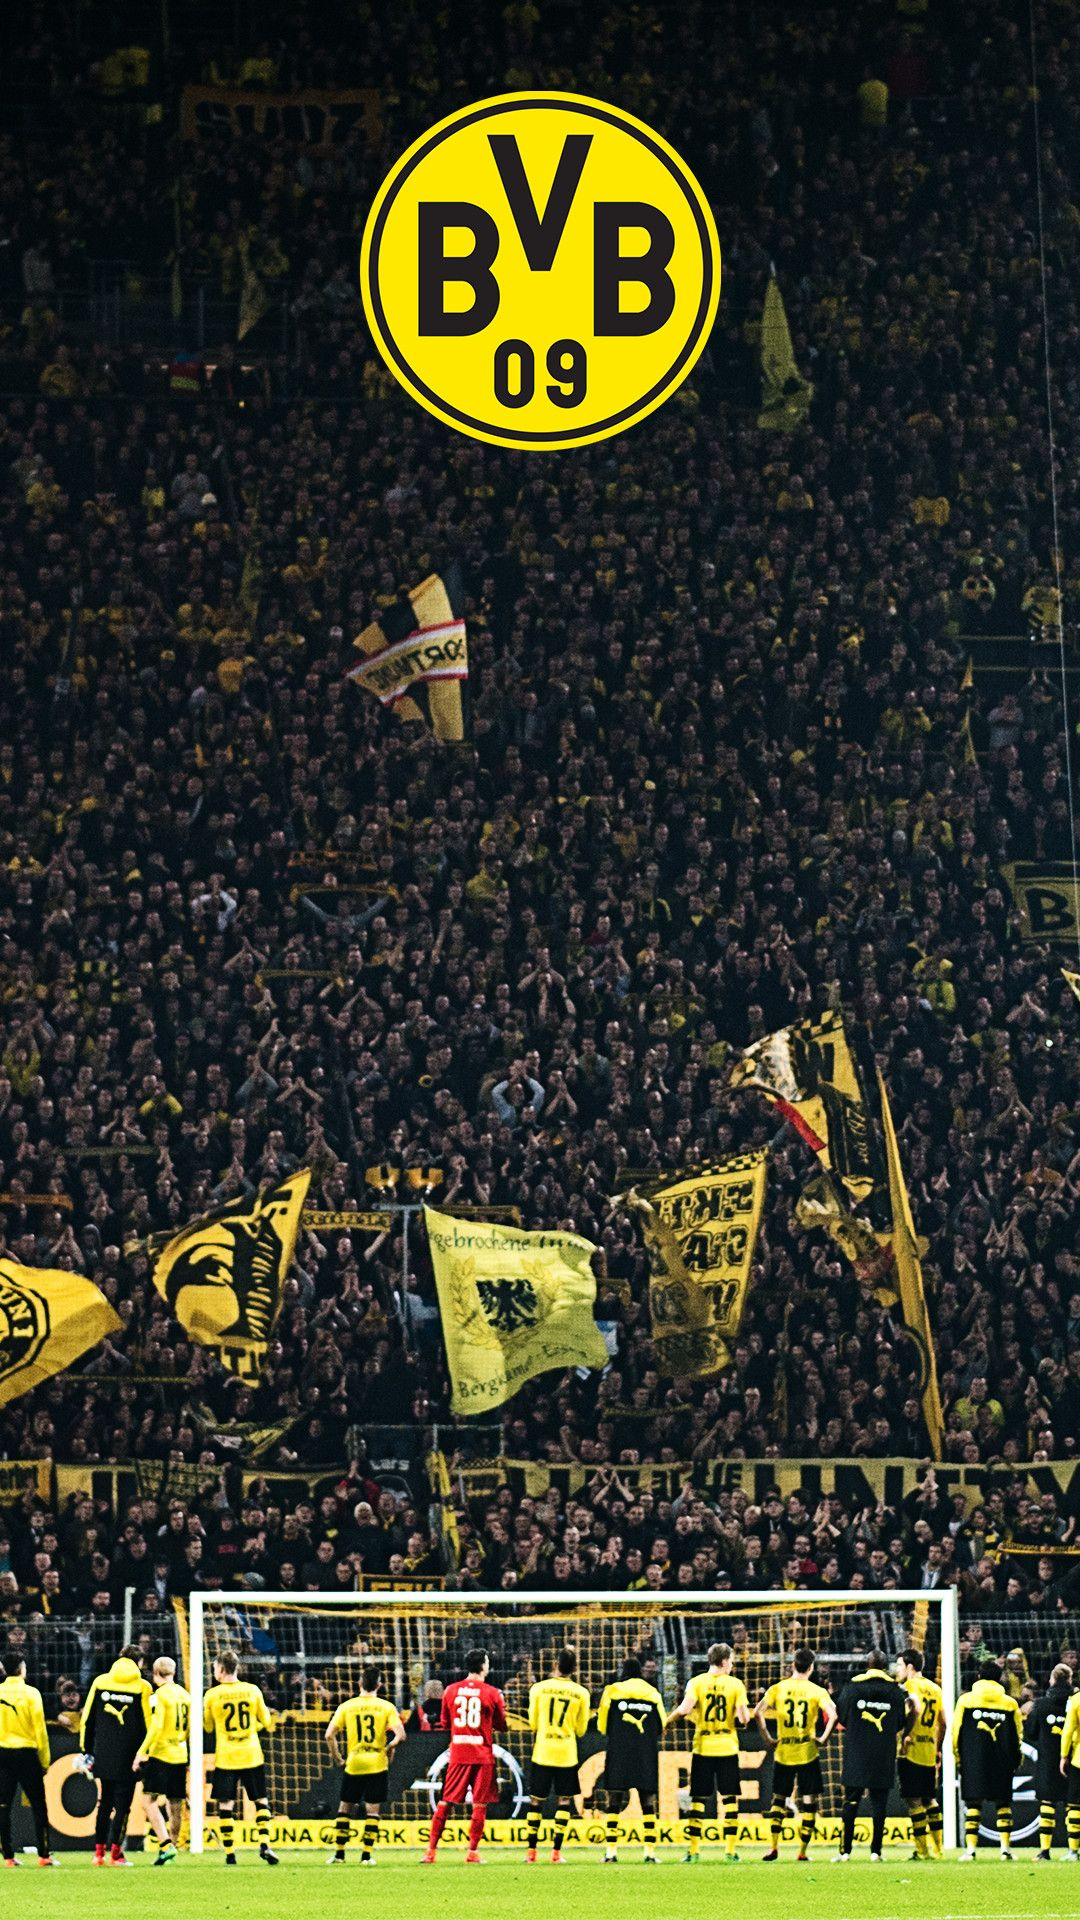 Borussia Dortmund Wallpapers 73 Images Borussia Dortmund Wallpaper Football Wallpaper Borussia Dortmund